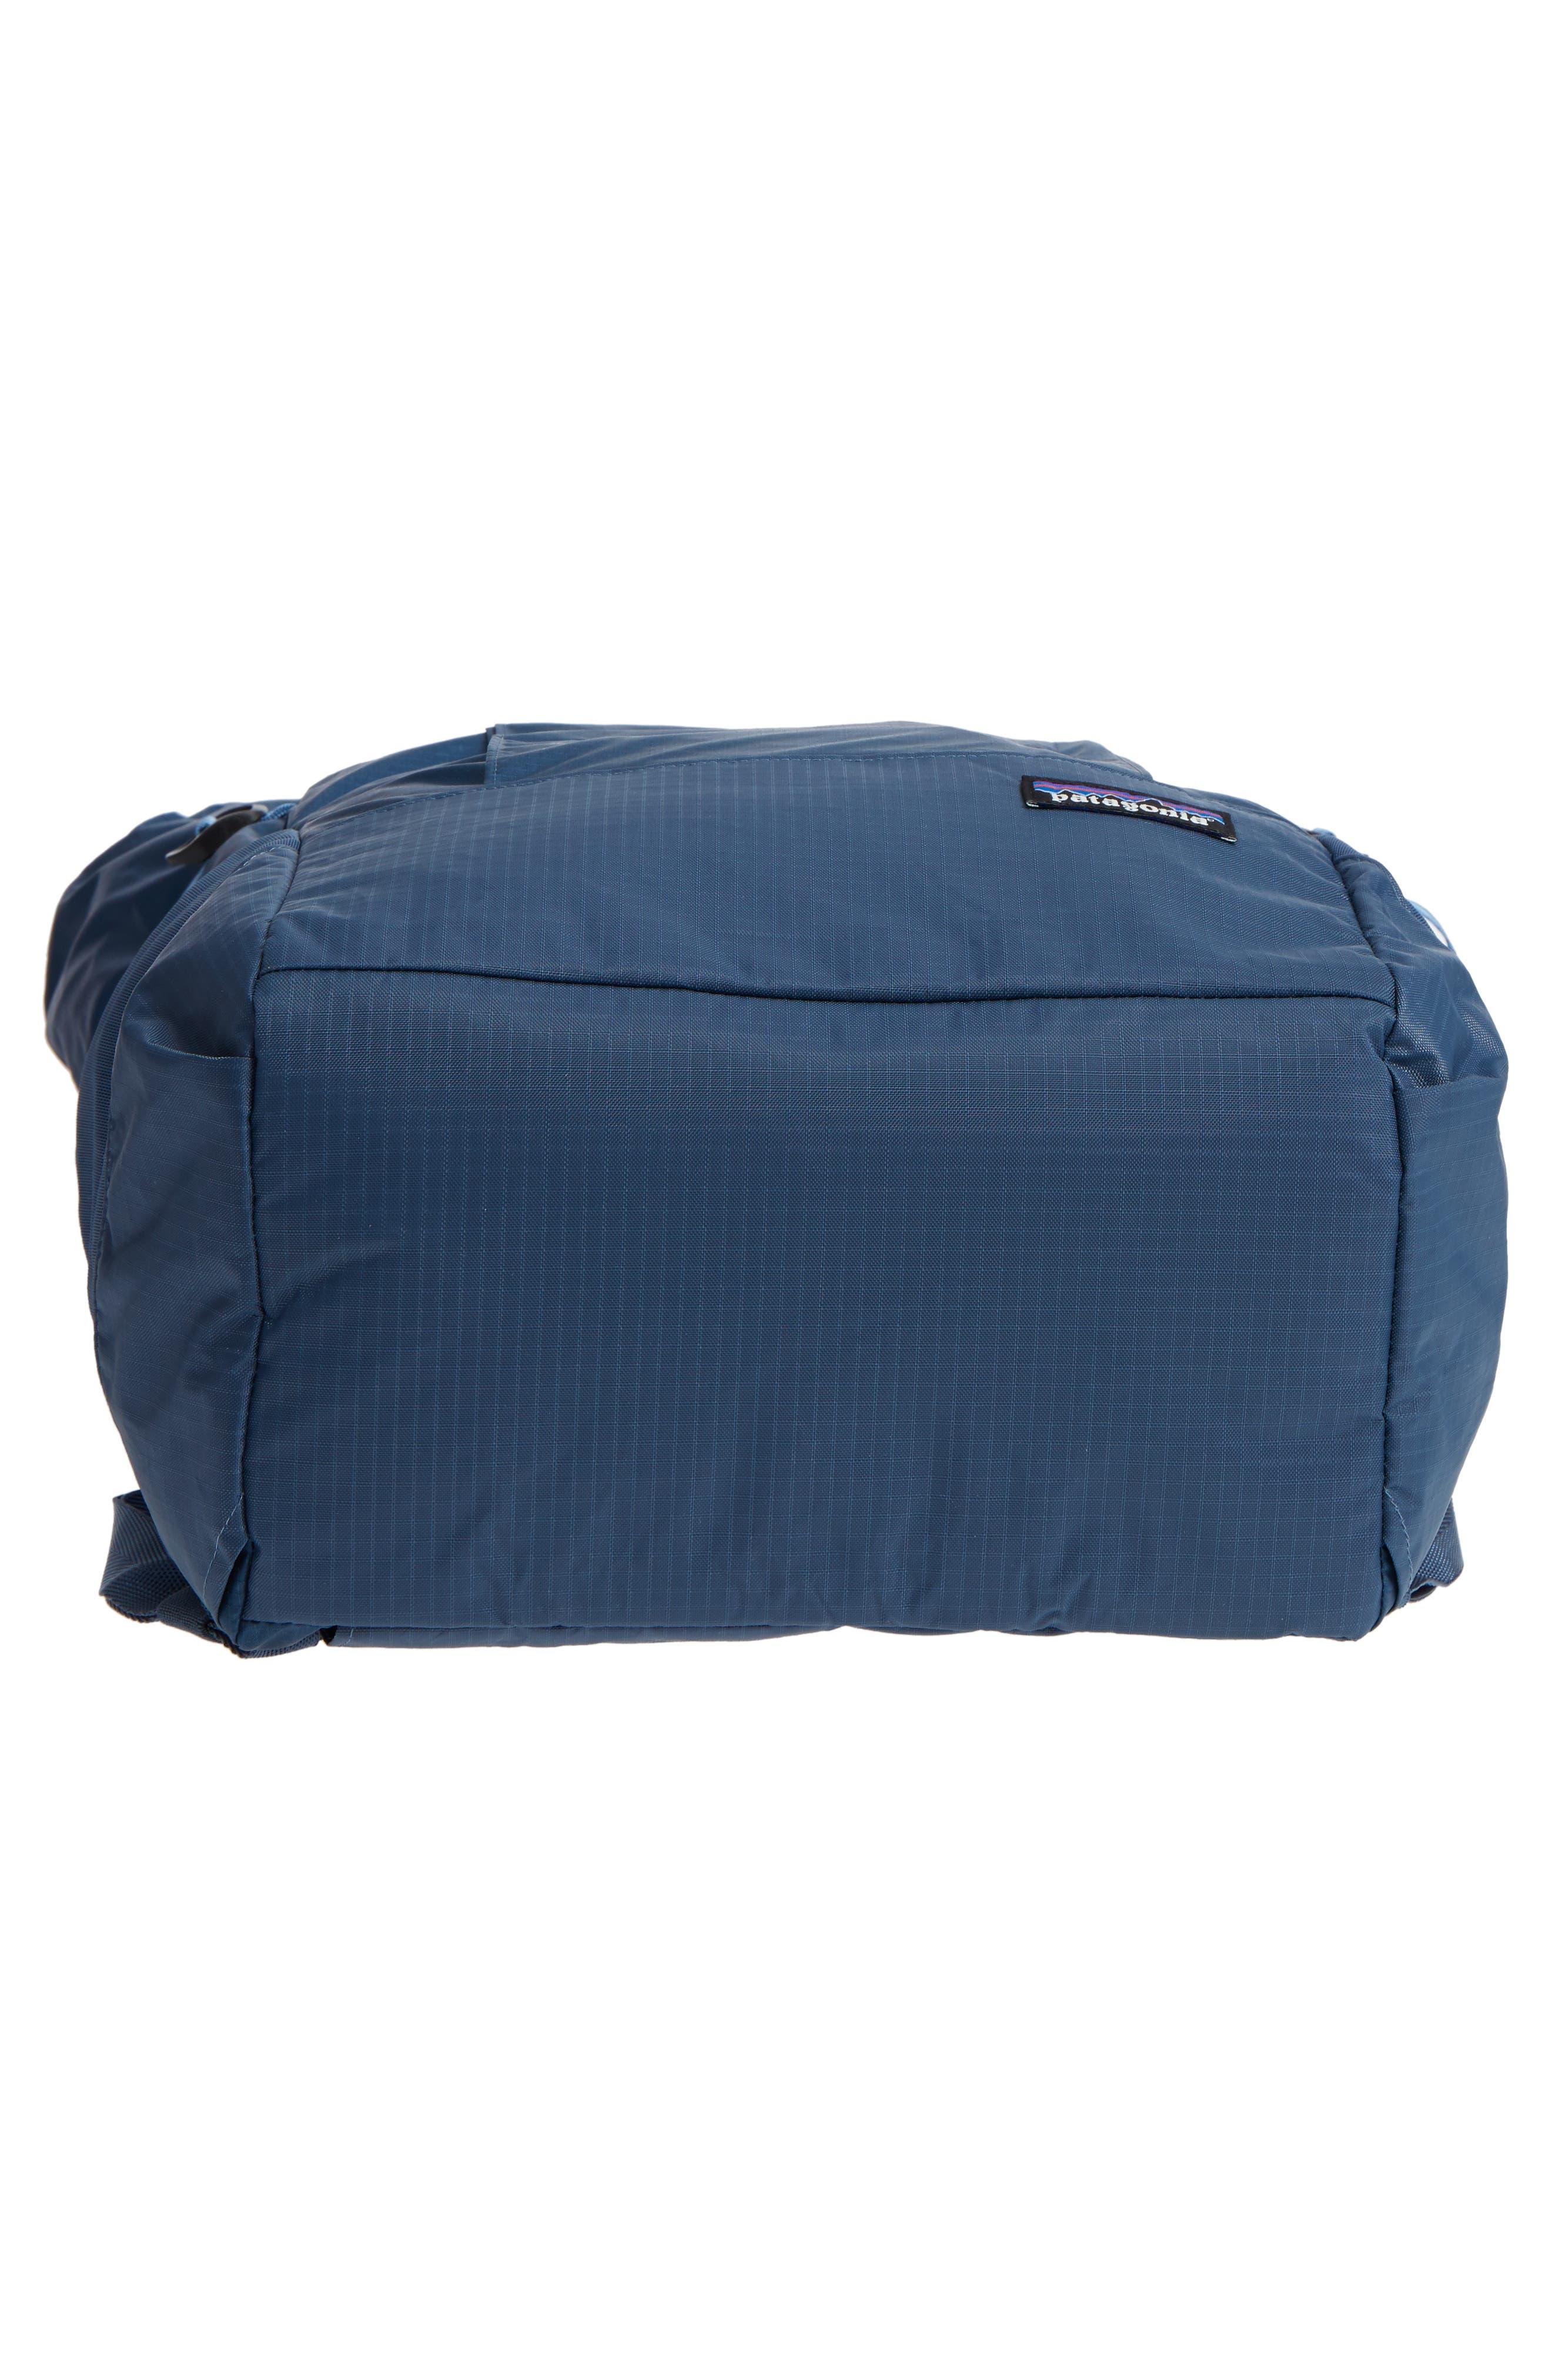 Lightweight Travel Tote Pack,                             Alternate thumbnail 5, color,                             Dolomite Blue